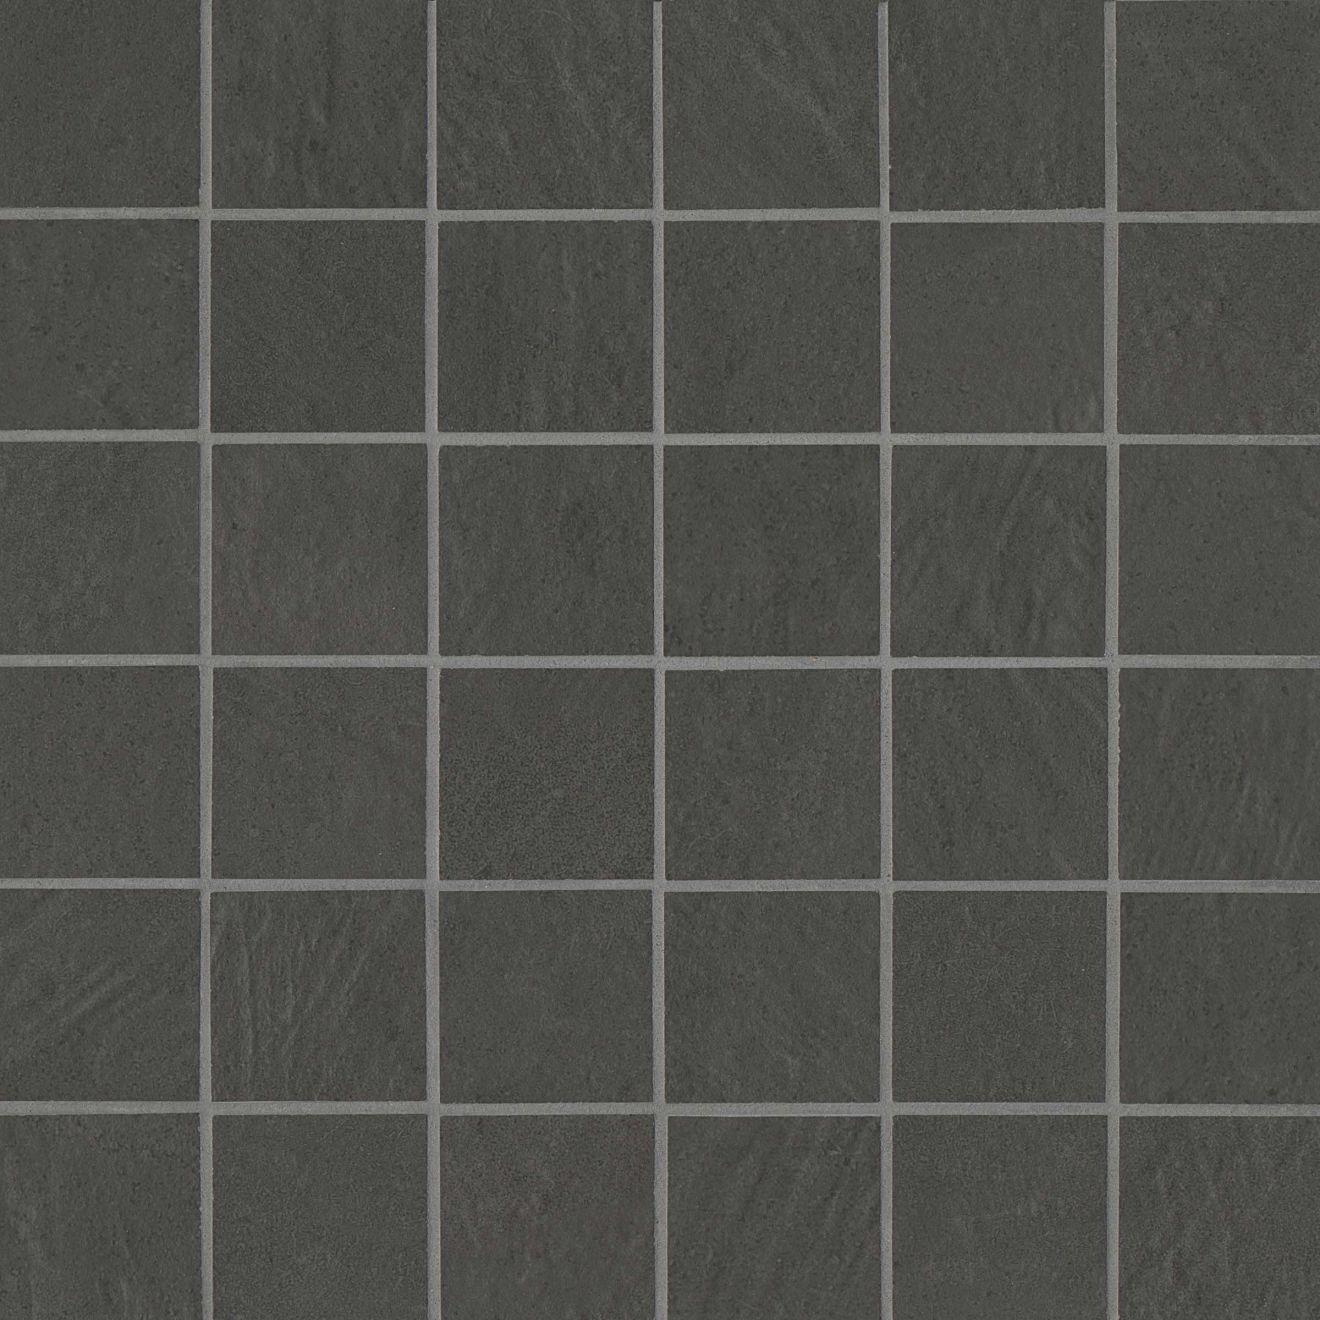 "Simply Modern 2"" x 2"" Floor & Wall Mosaic in Black"